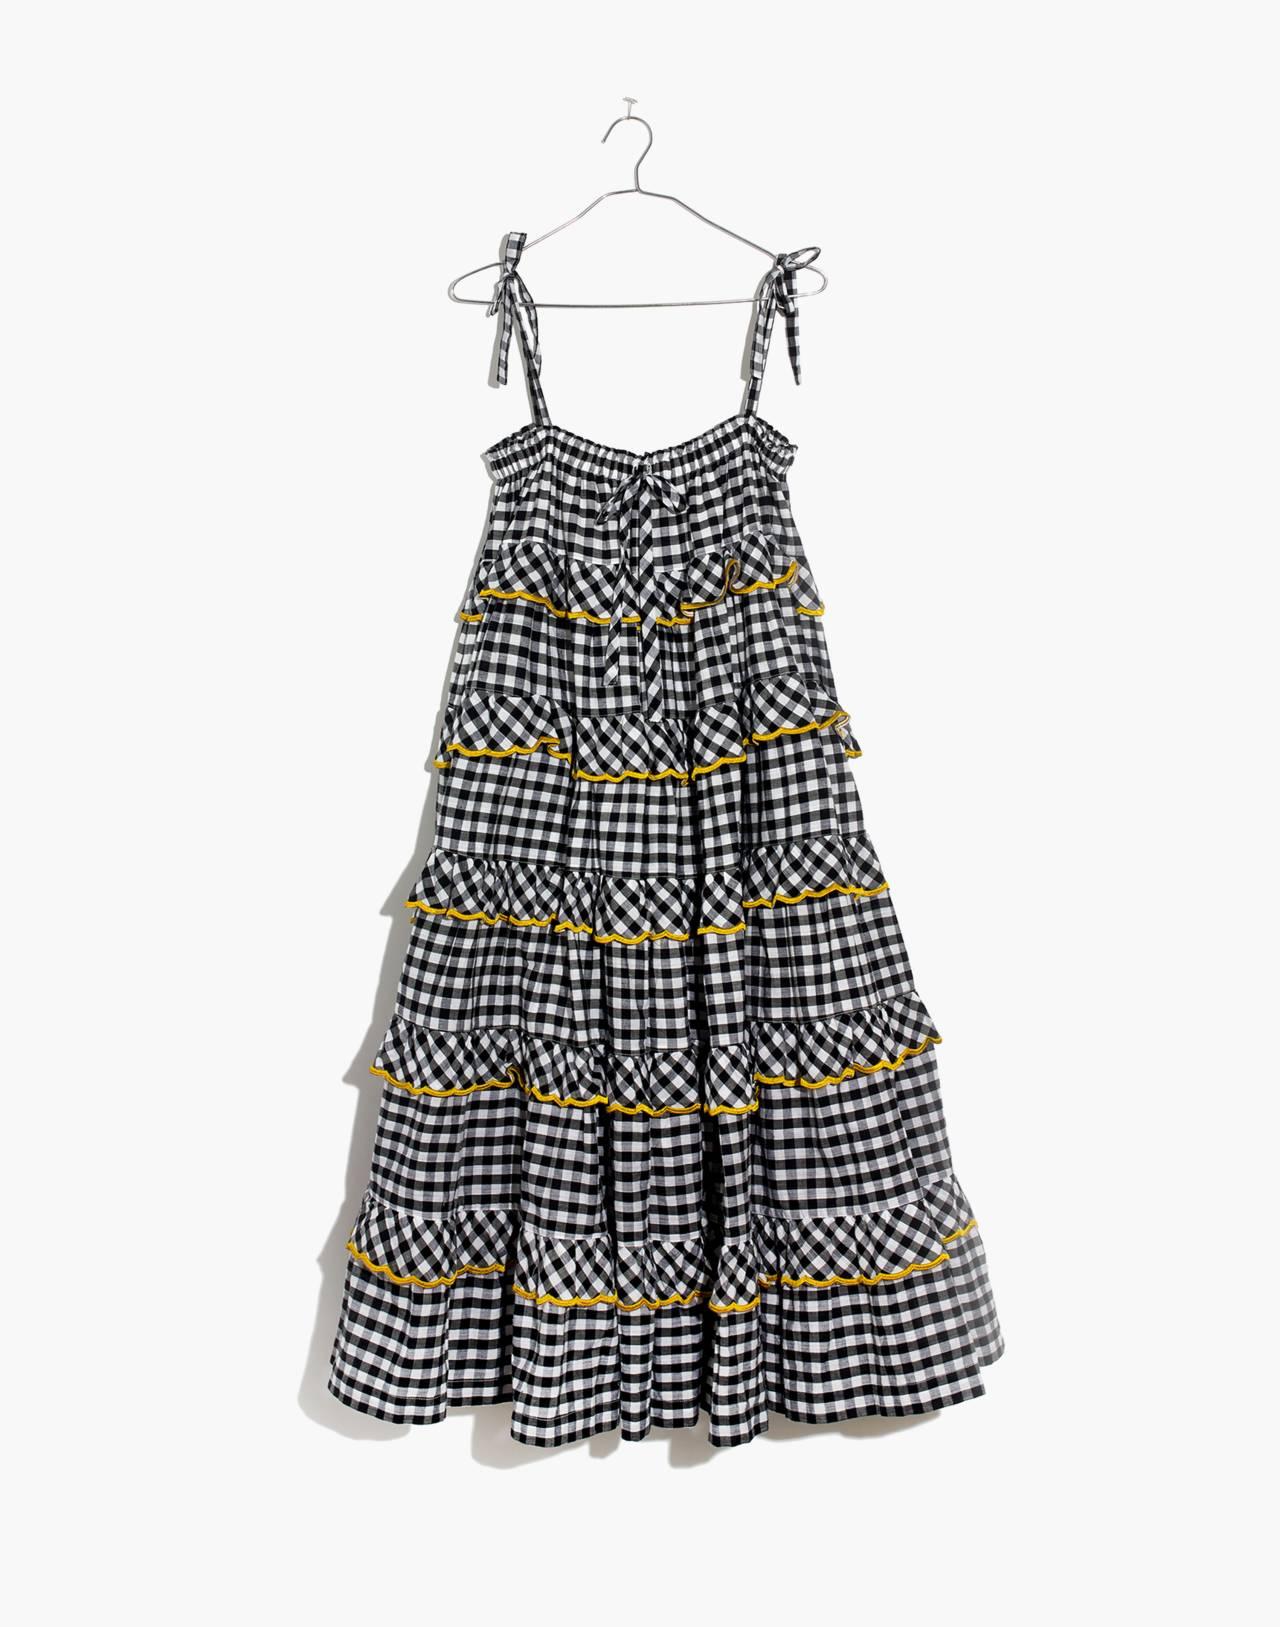 Innika Choo Tiered Gingham Avens Dress in black check image 4